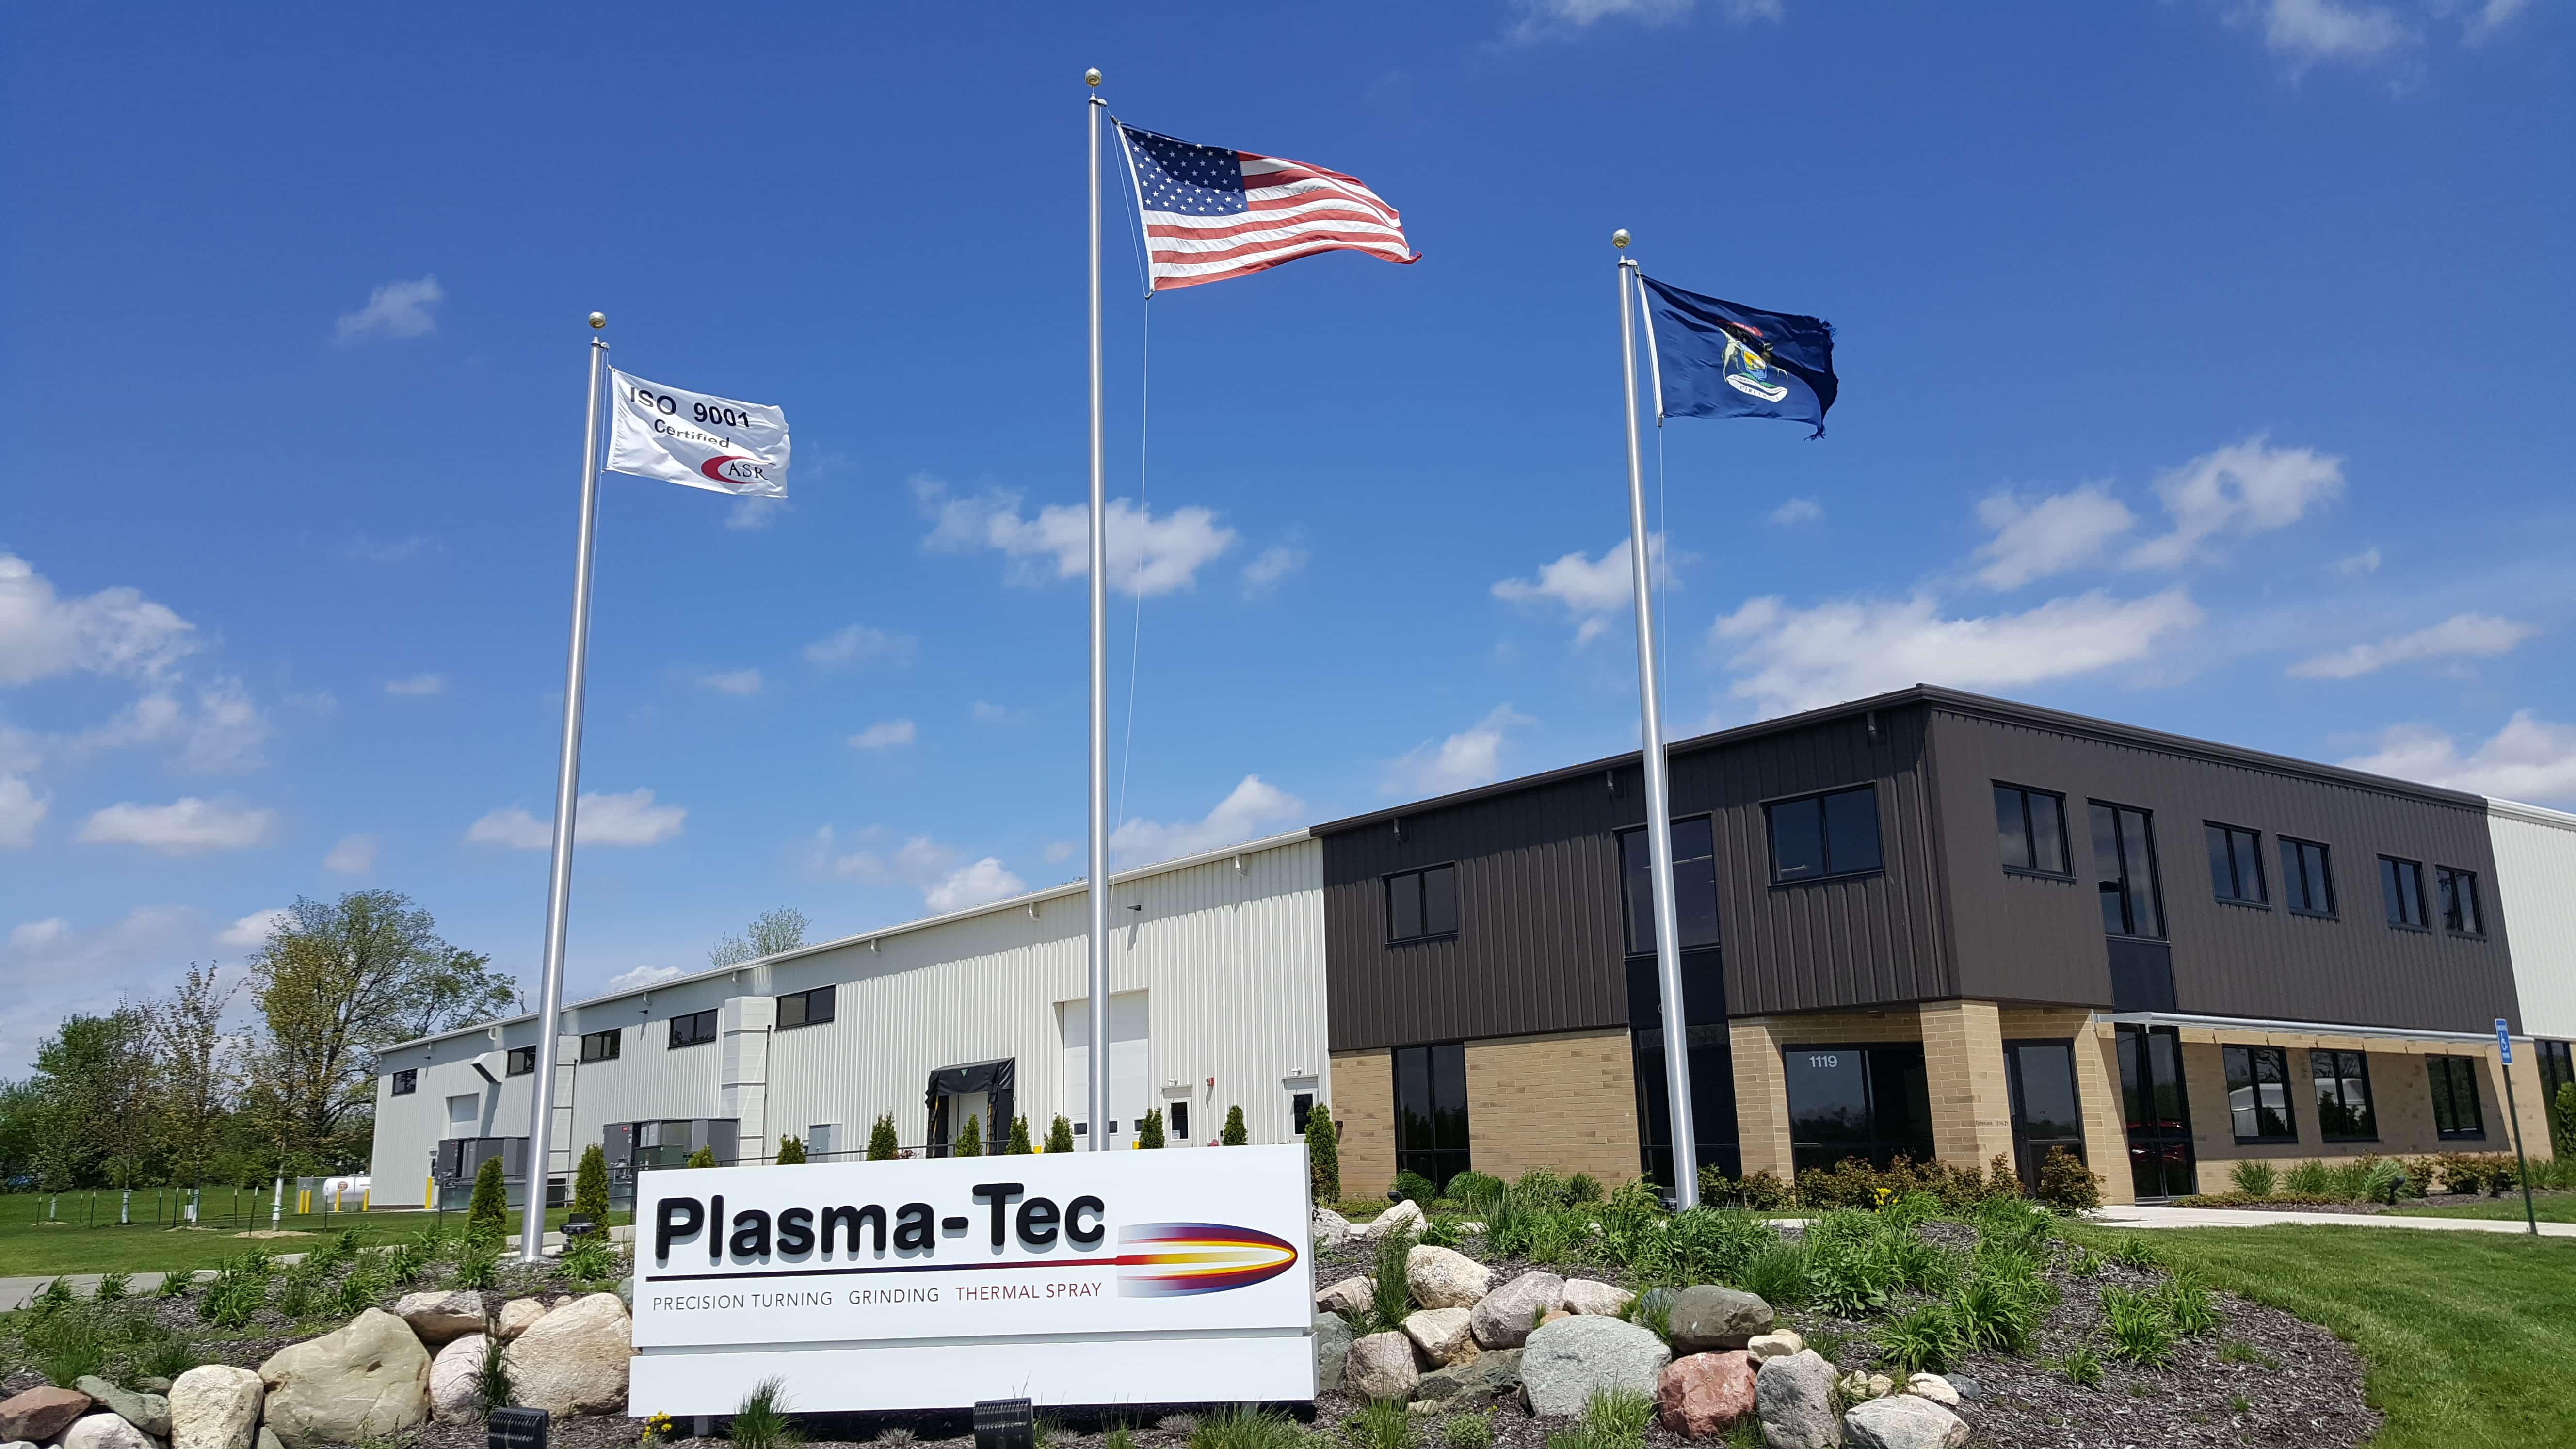 Plasma-Tec Building